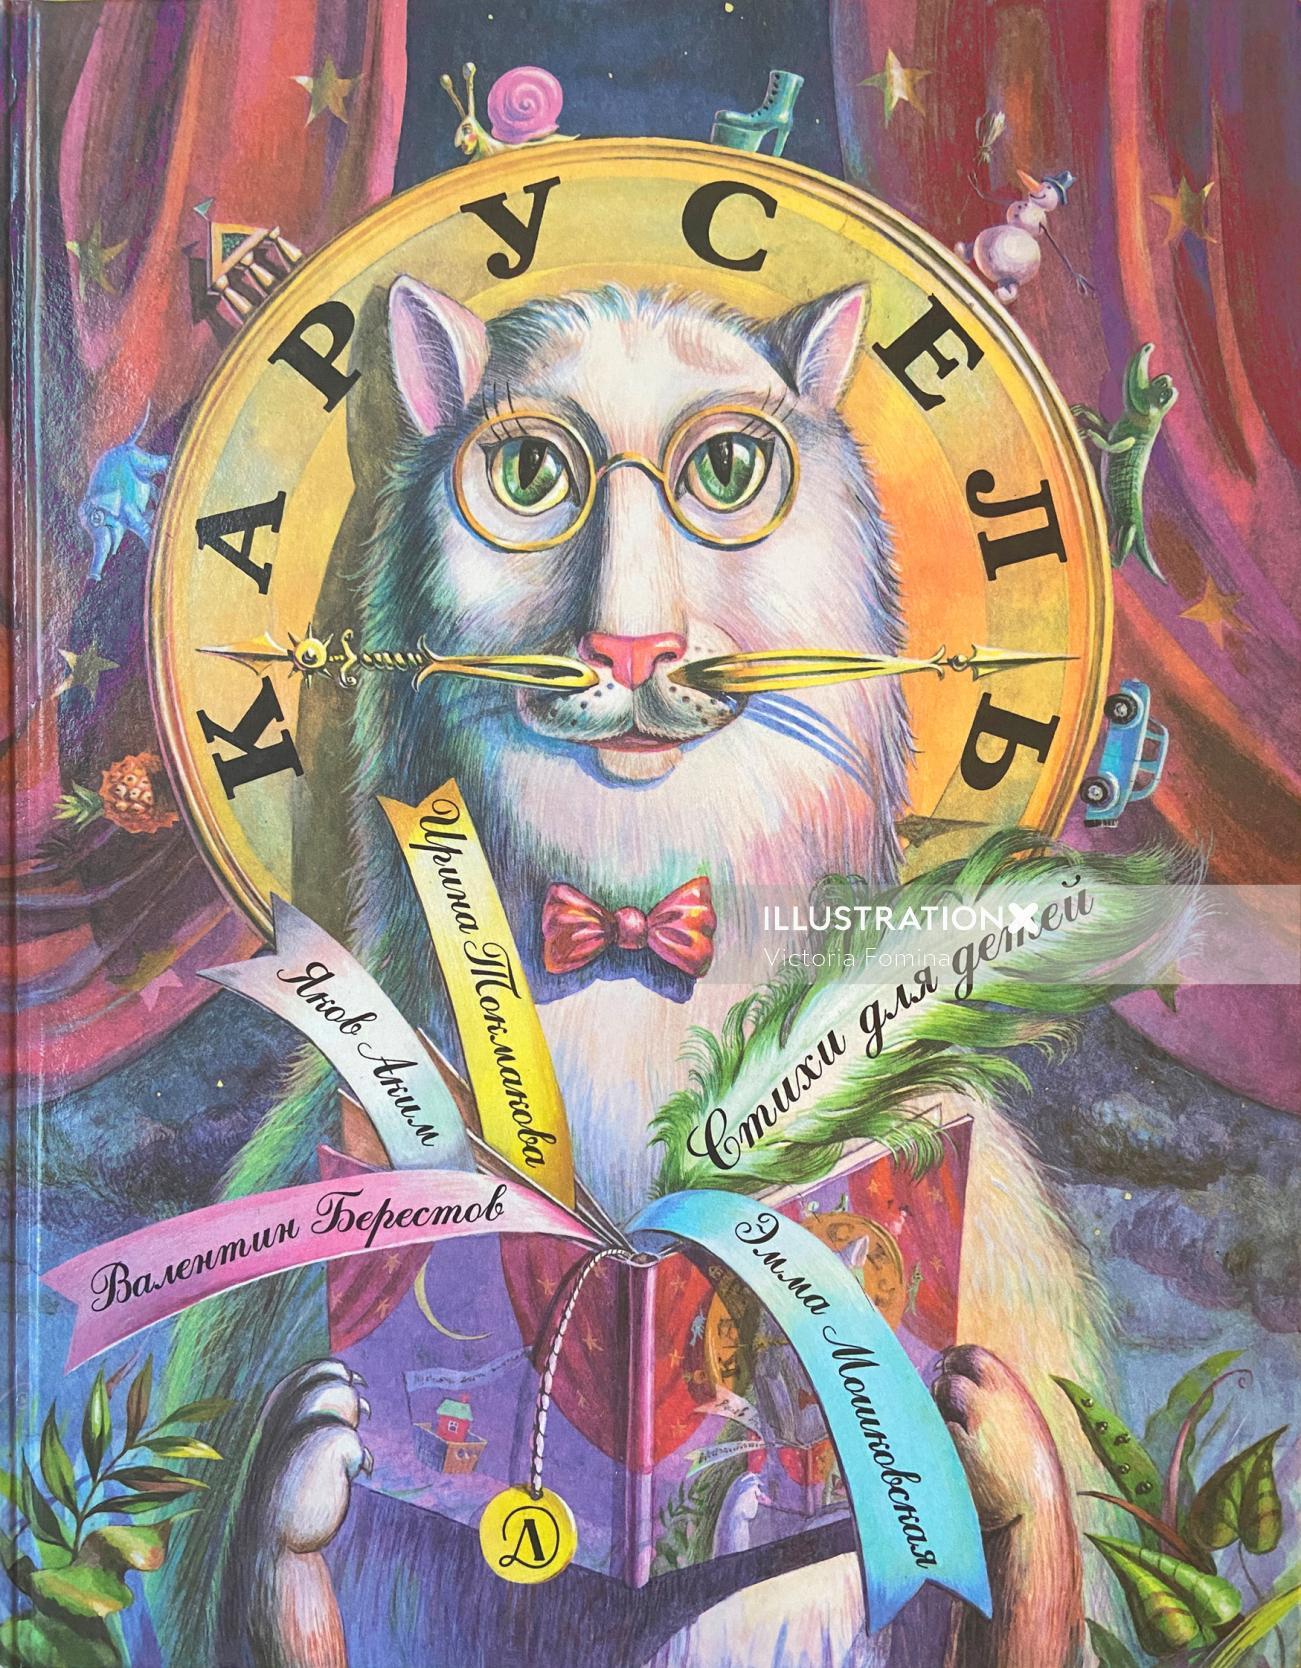 Book cover illustration of kapycejib by Victoria Fomina